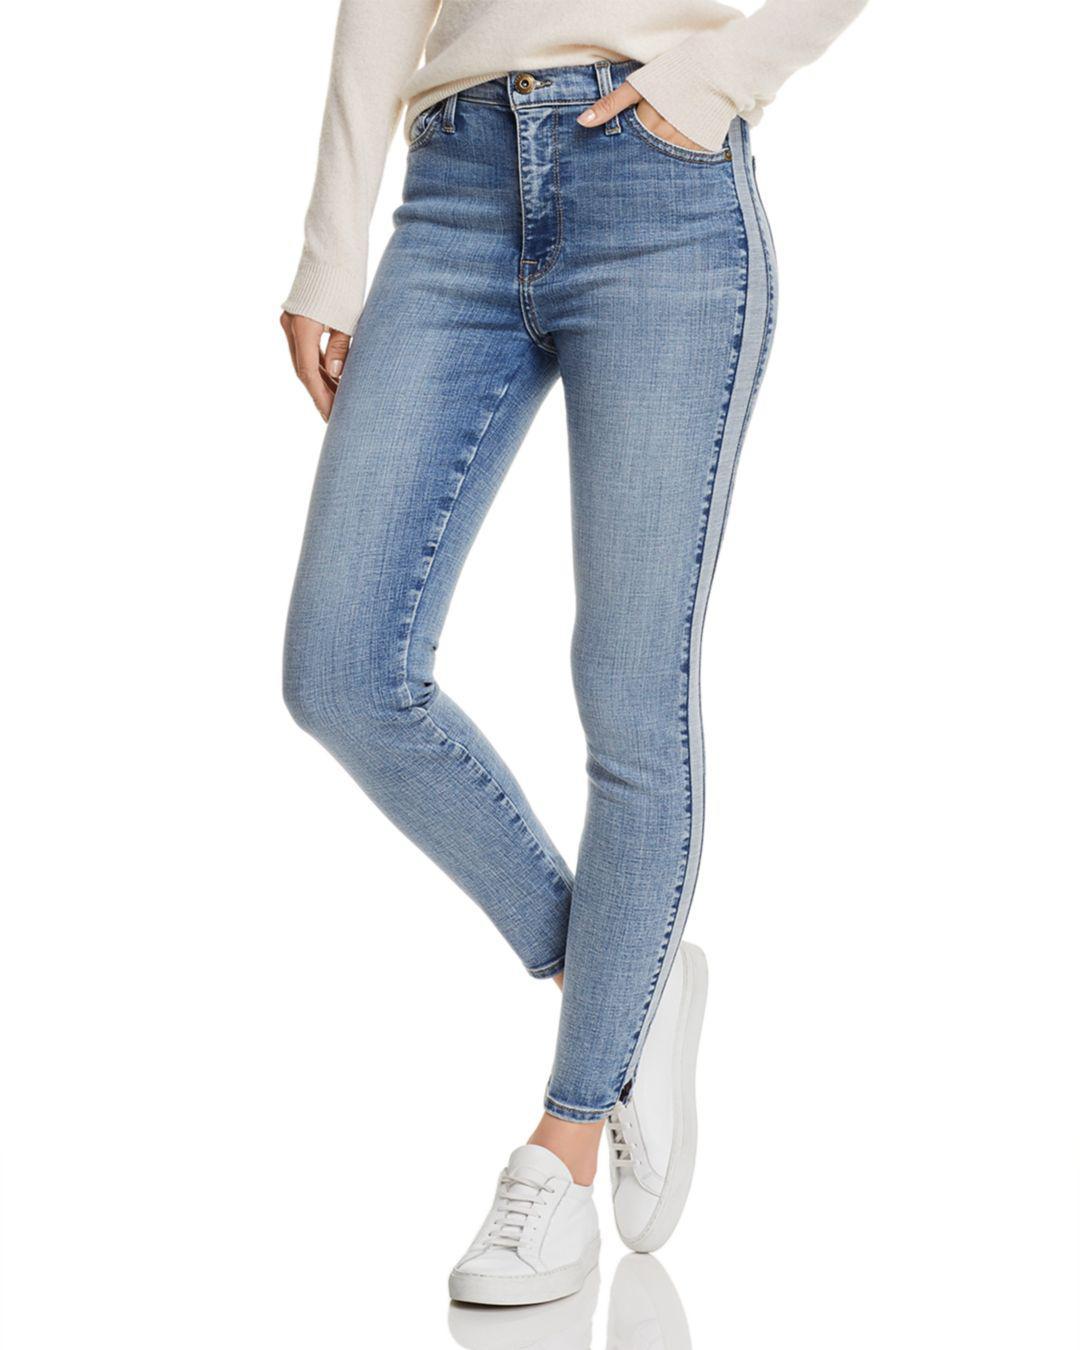 206f1c64b88 Lyst - Pistola High-rise Tuxedo Stripe Skinny Jeans In Vice Versa in ...